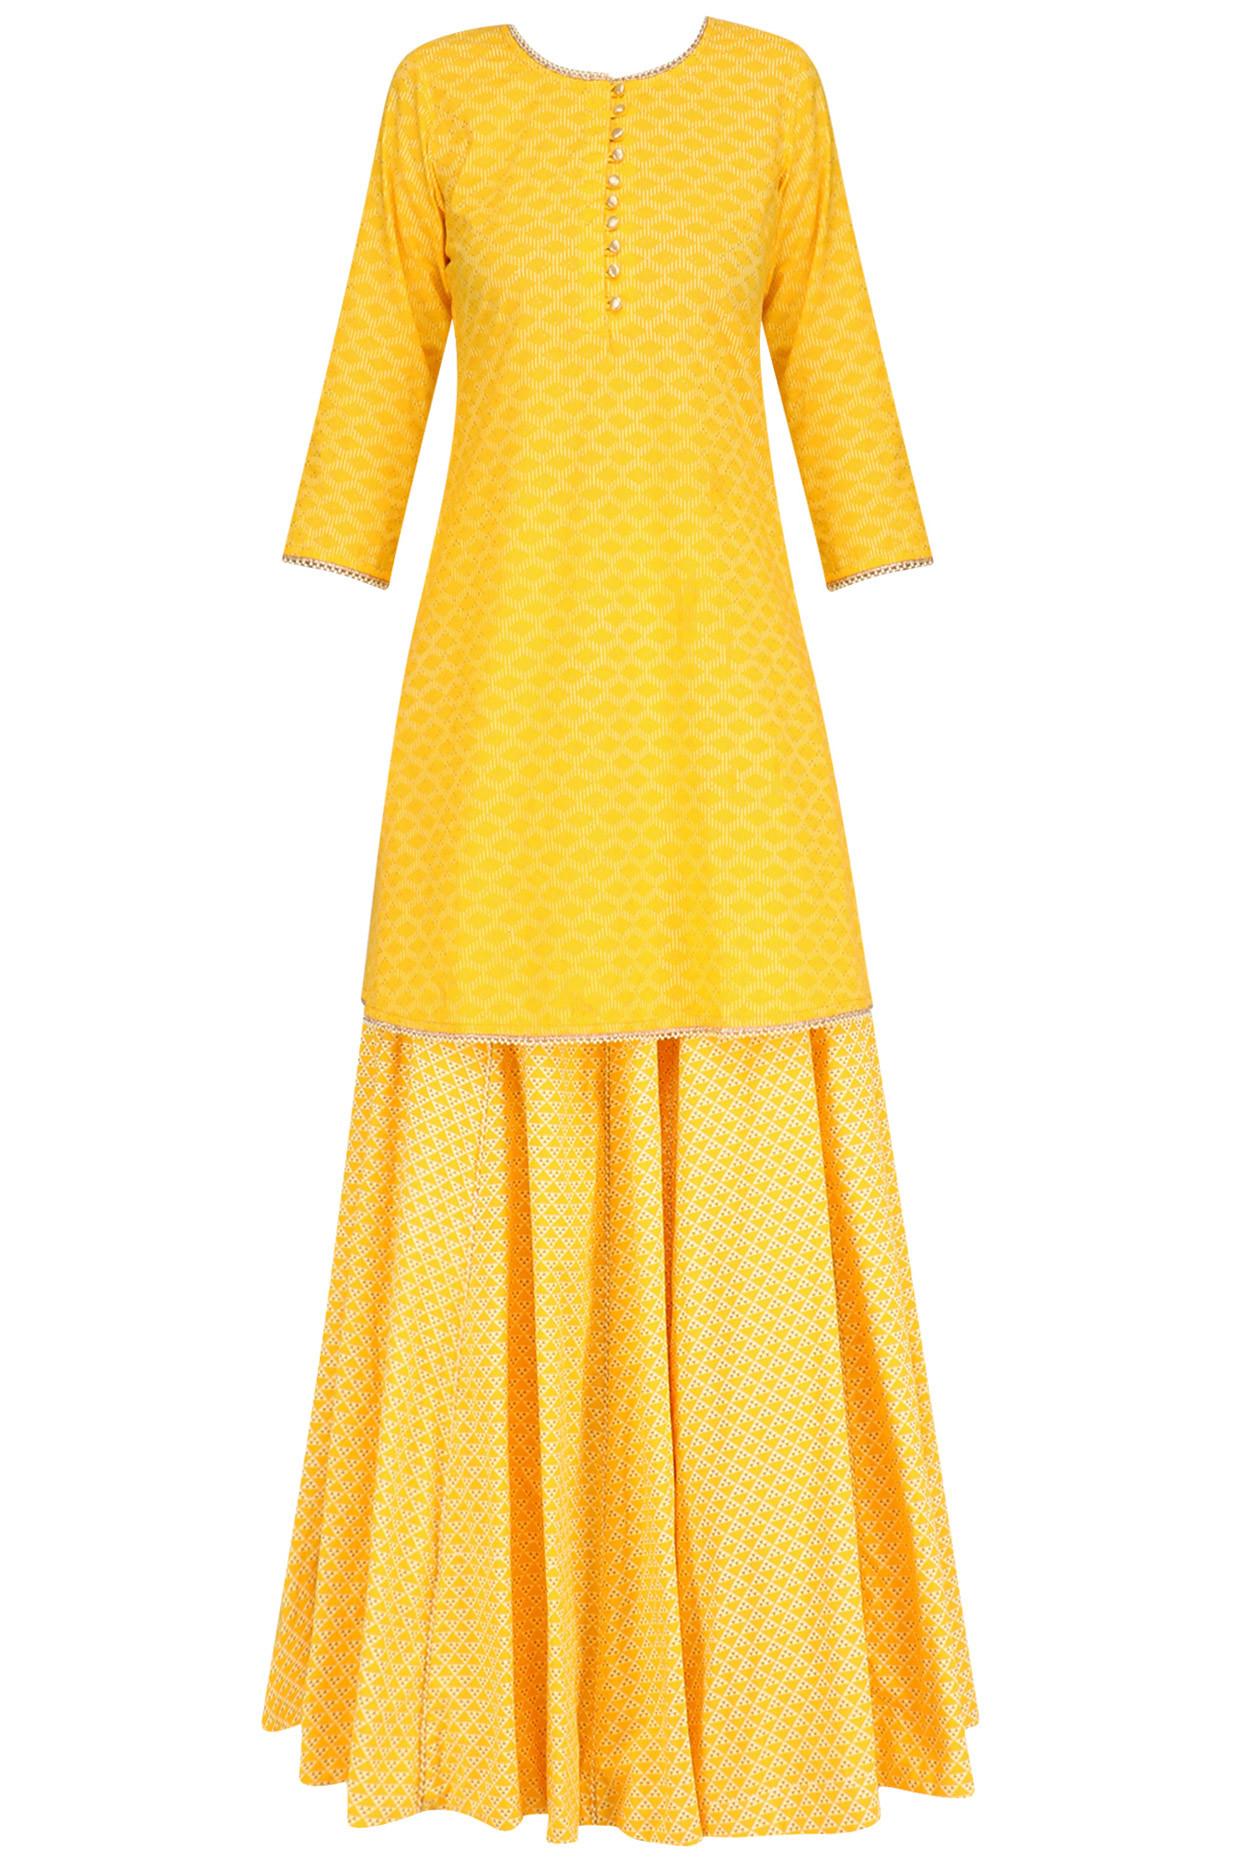 Yellow Pearl Embroidered Short Kurta and Skirt Set by Surendri